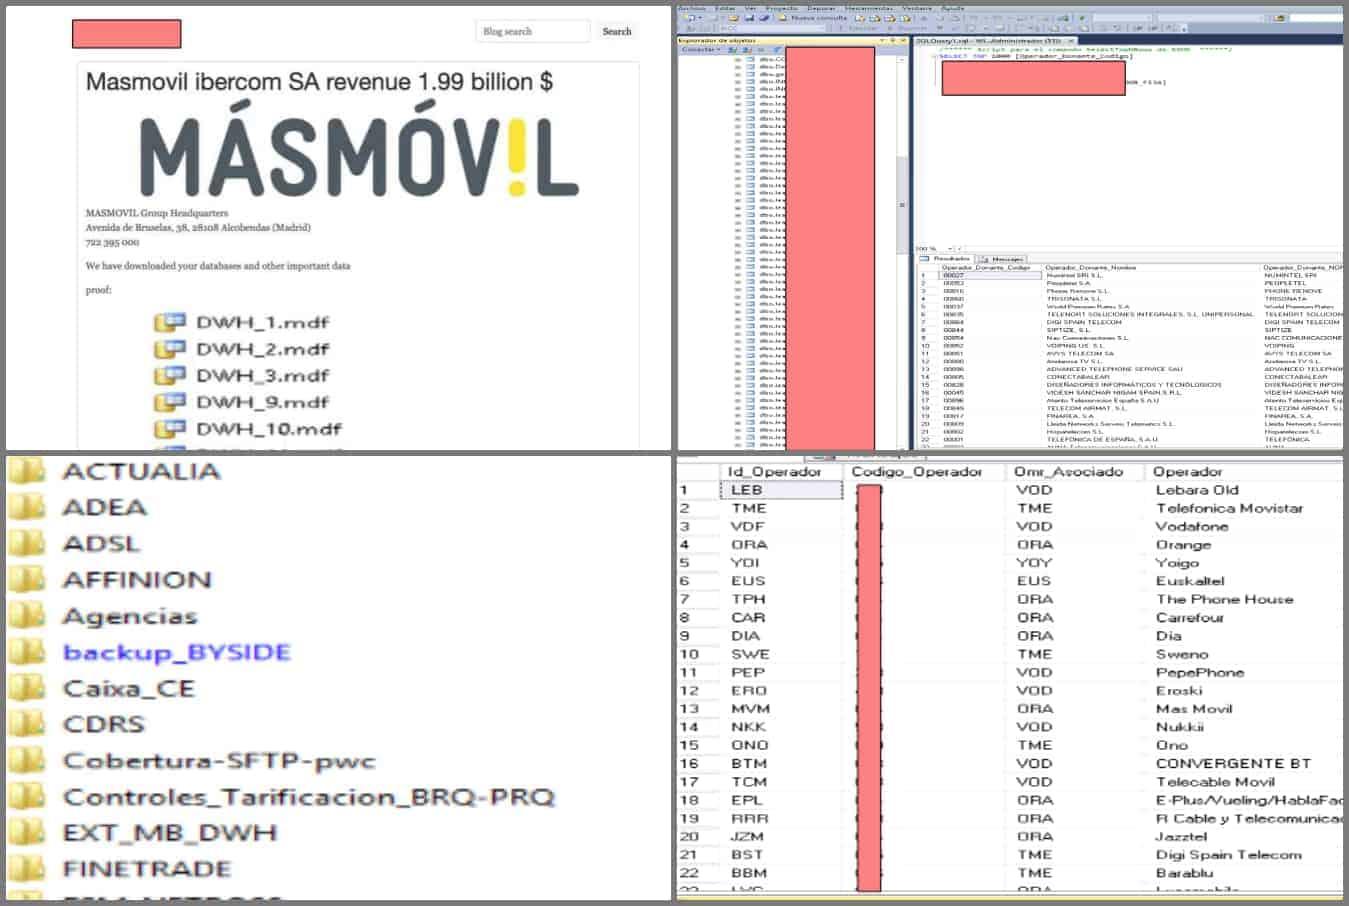 Spanish Telecom Giant MasMovil Hit by Revil Ransomware Attack